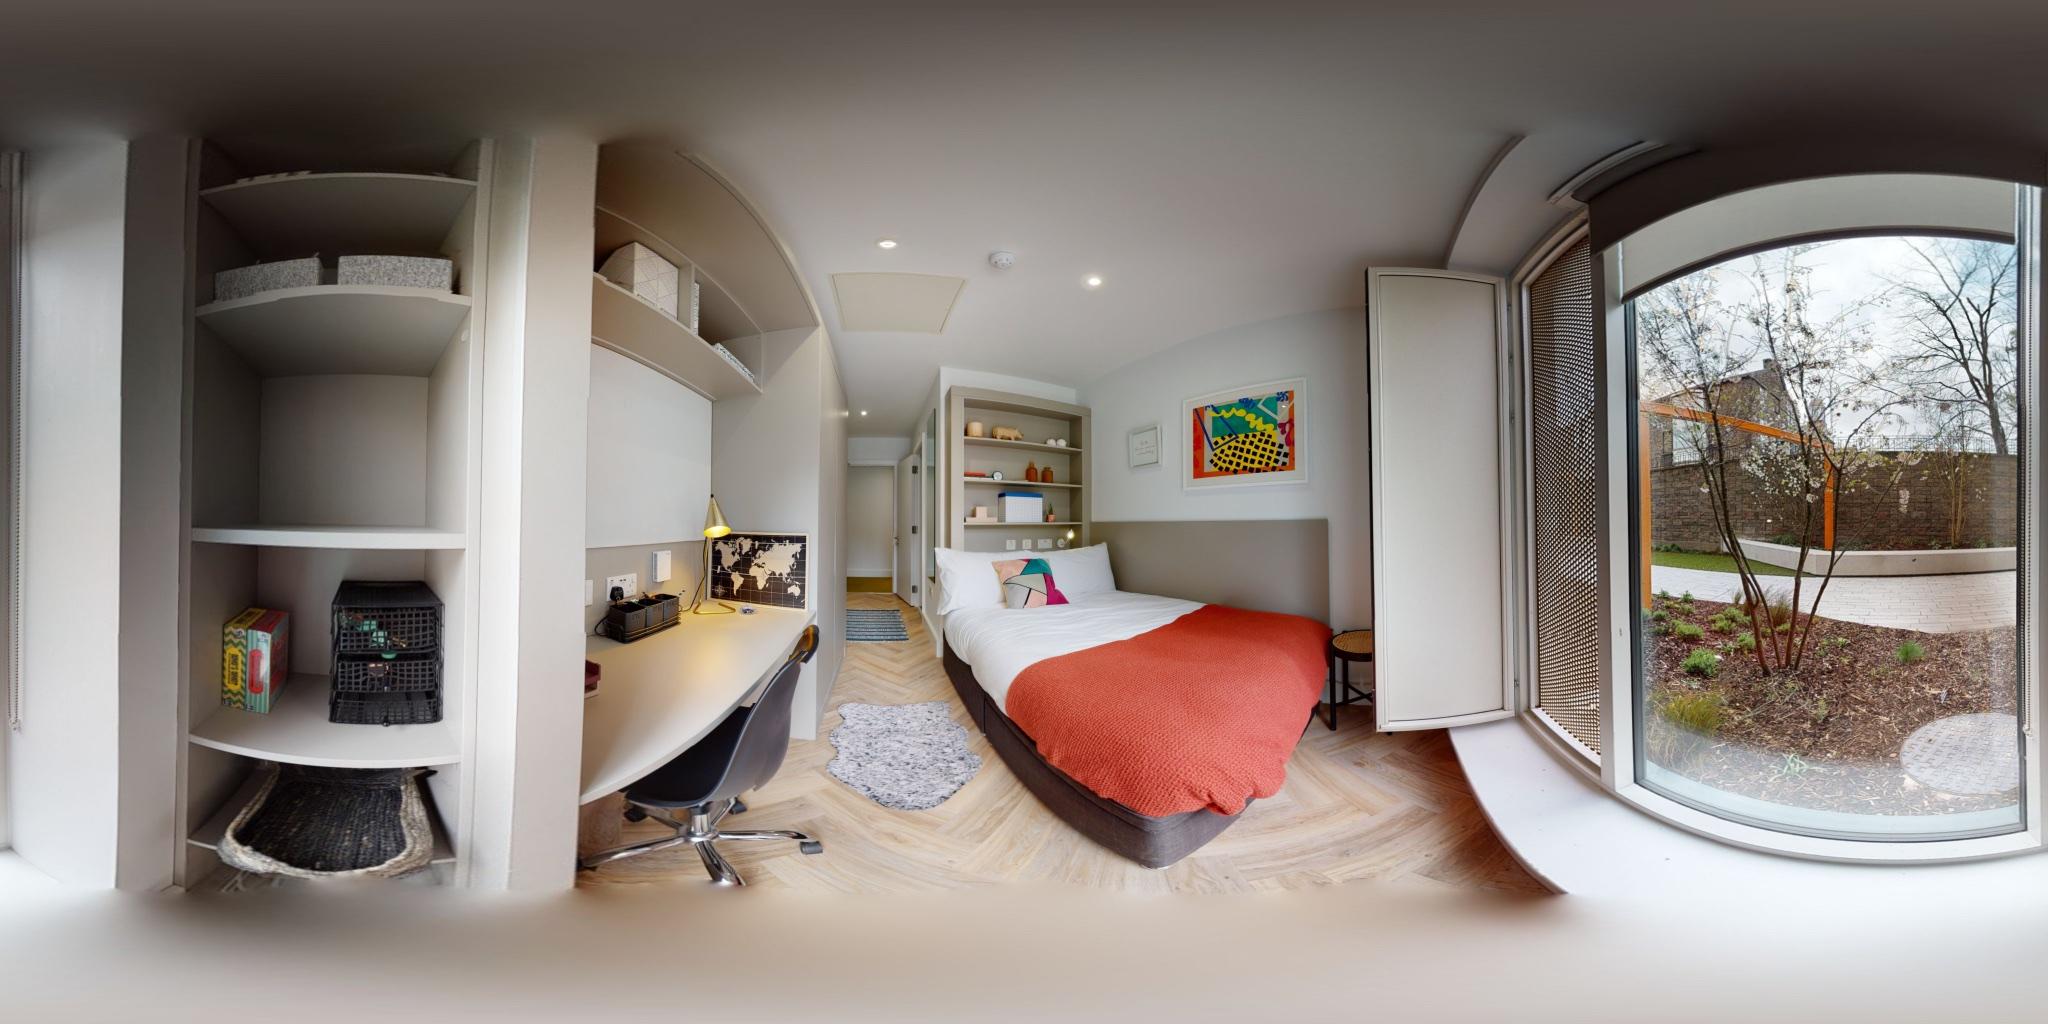 Student Residence Accommodation MatterportWalkthrough Ireland